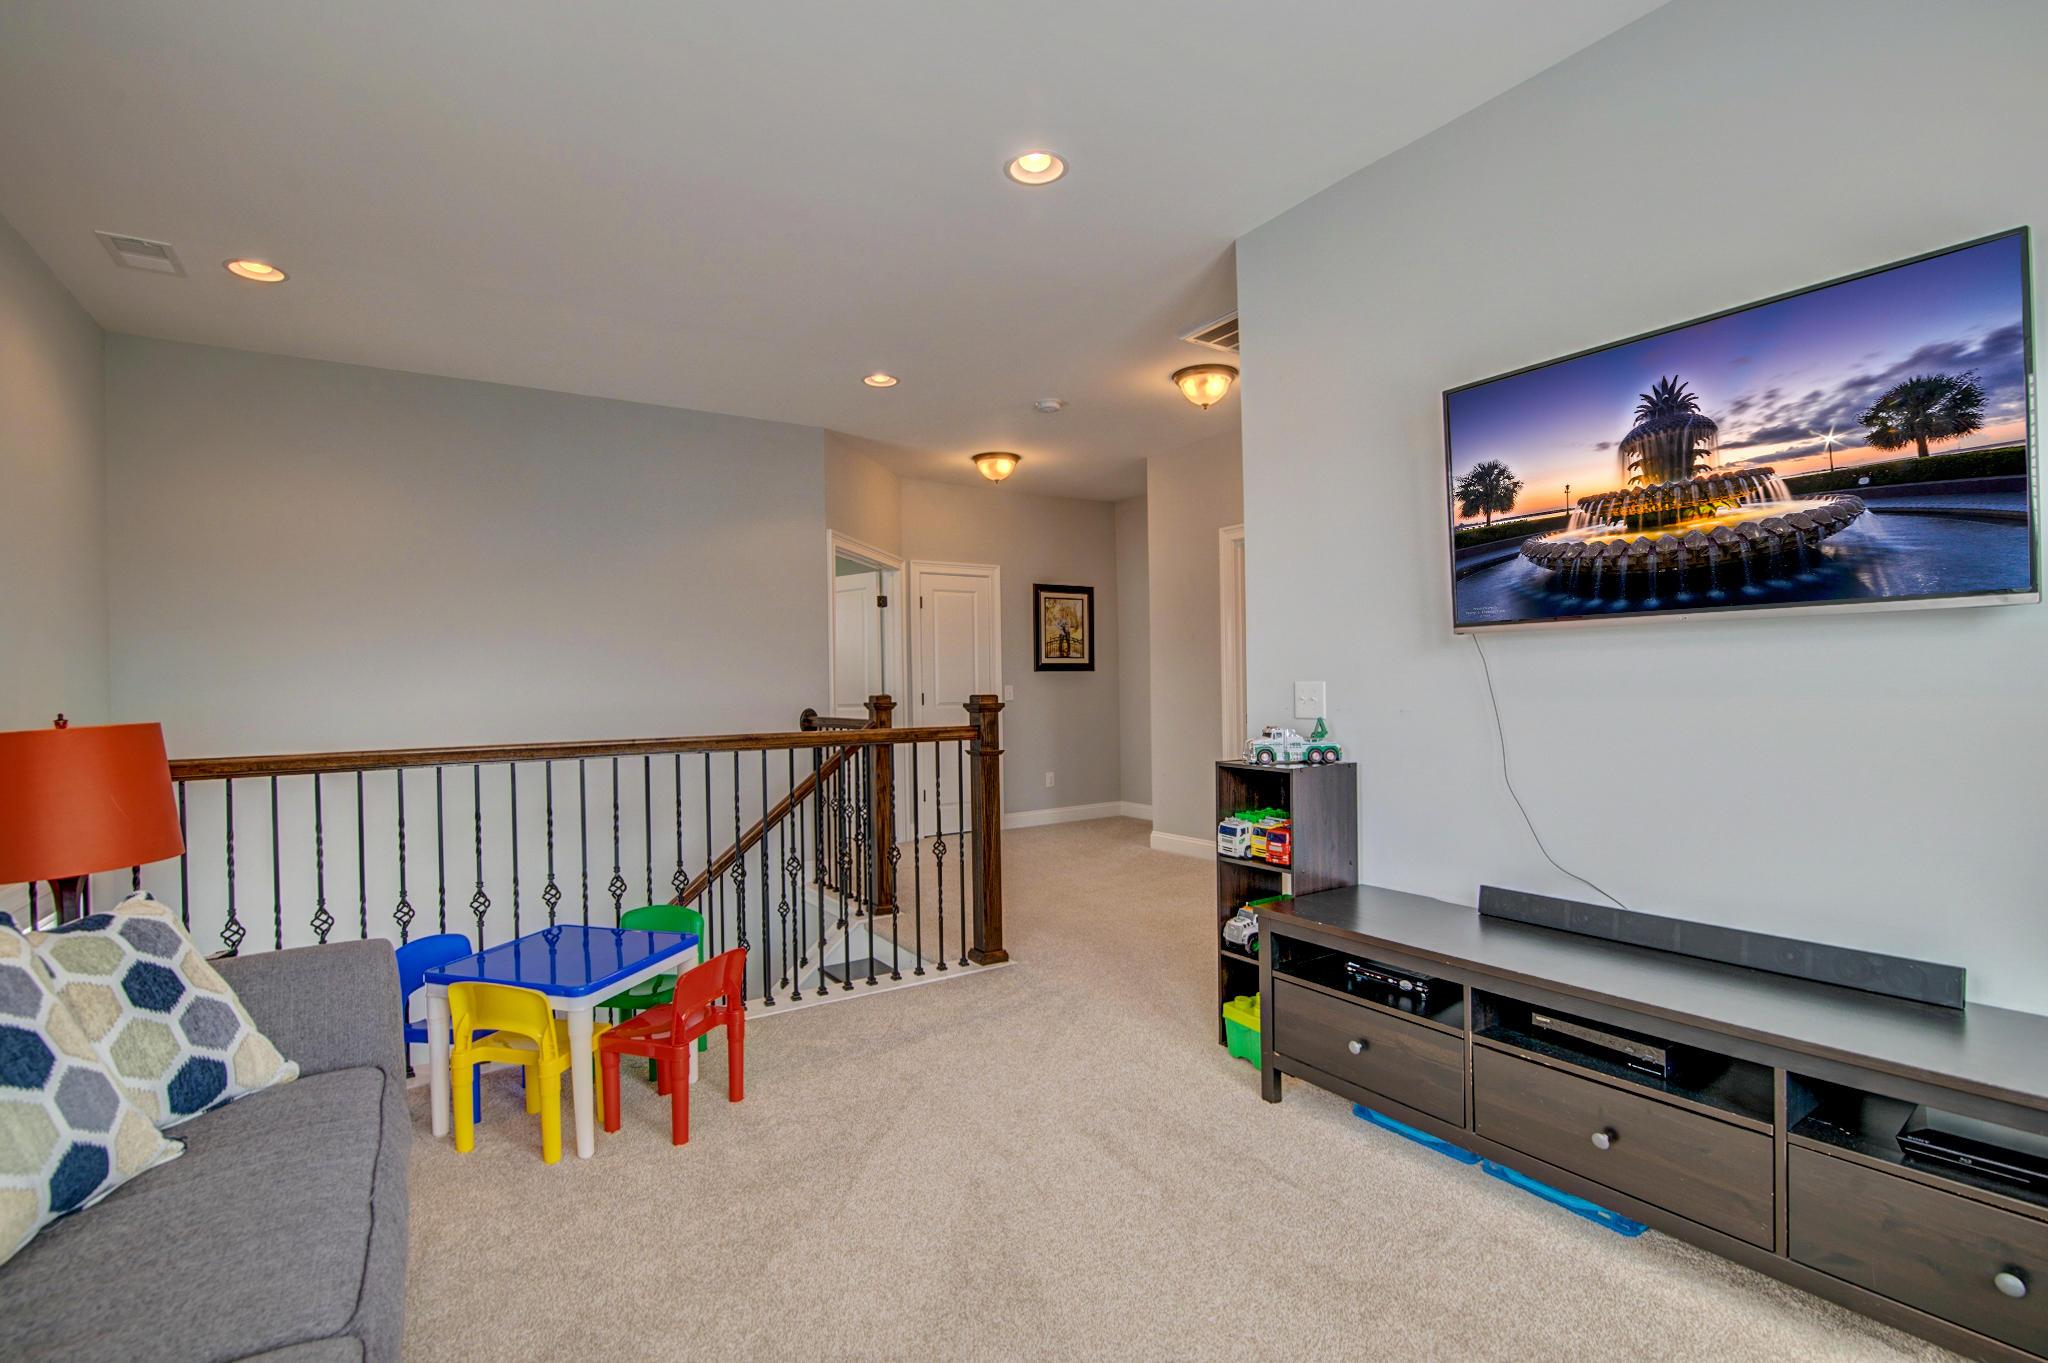 Carolina Park Homes For Sale - 3634 Spindrift, Mount Pleasant, SC - 17